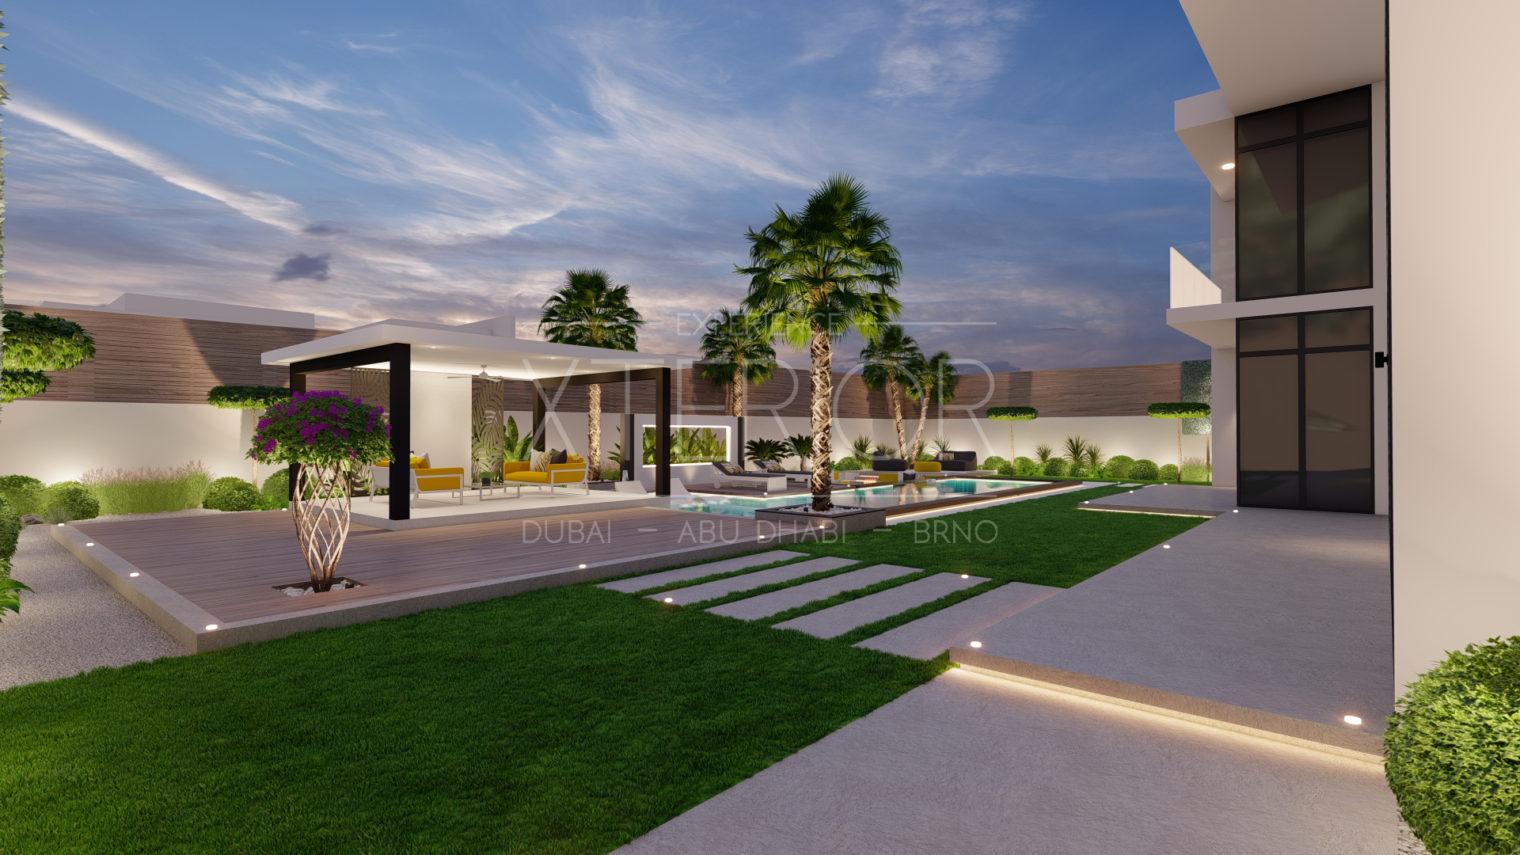 Landscape Design Companies in dubai